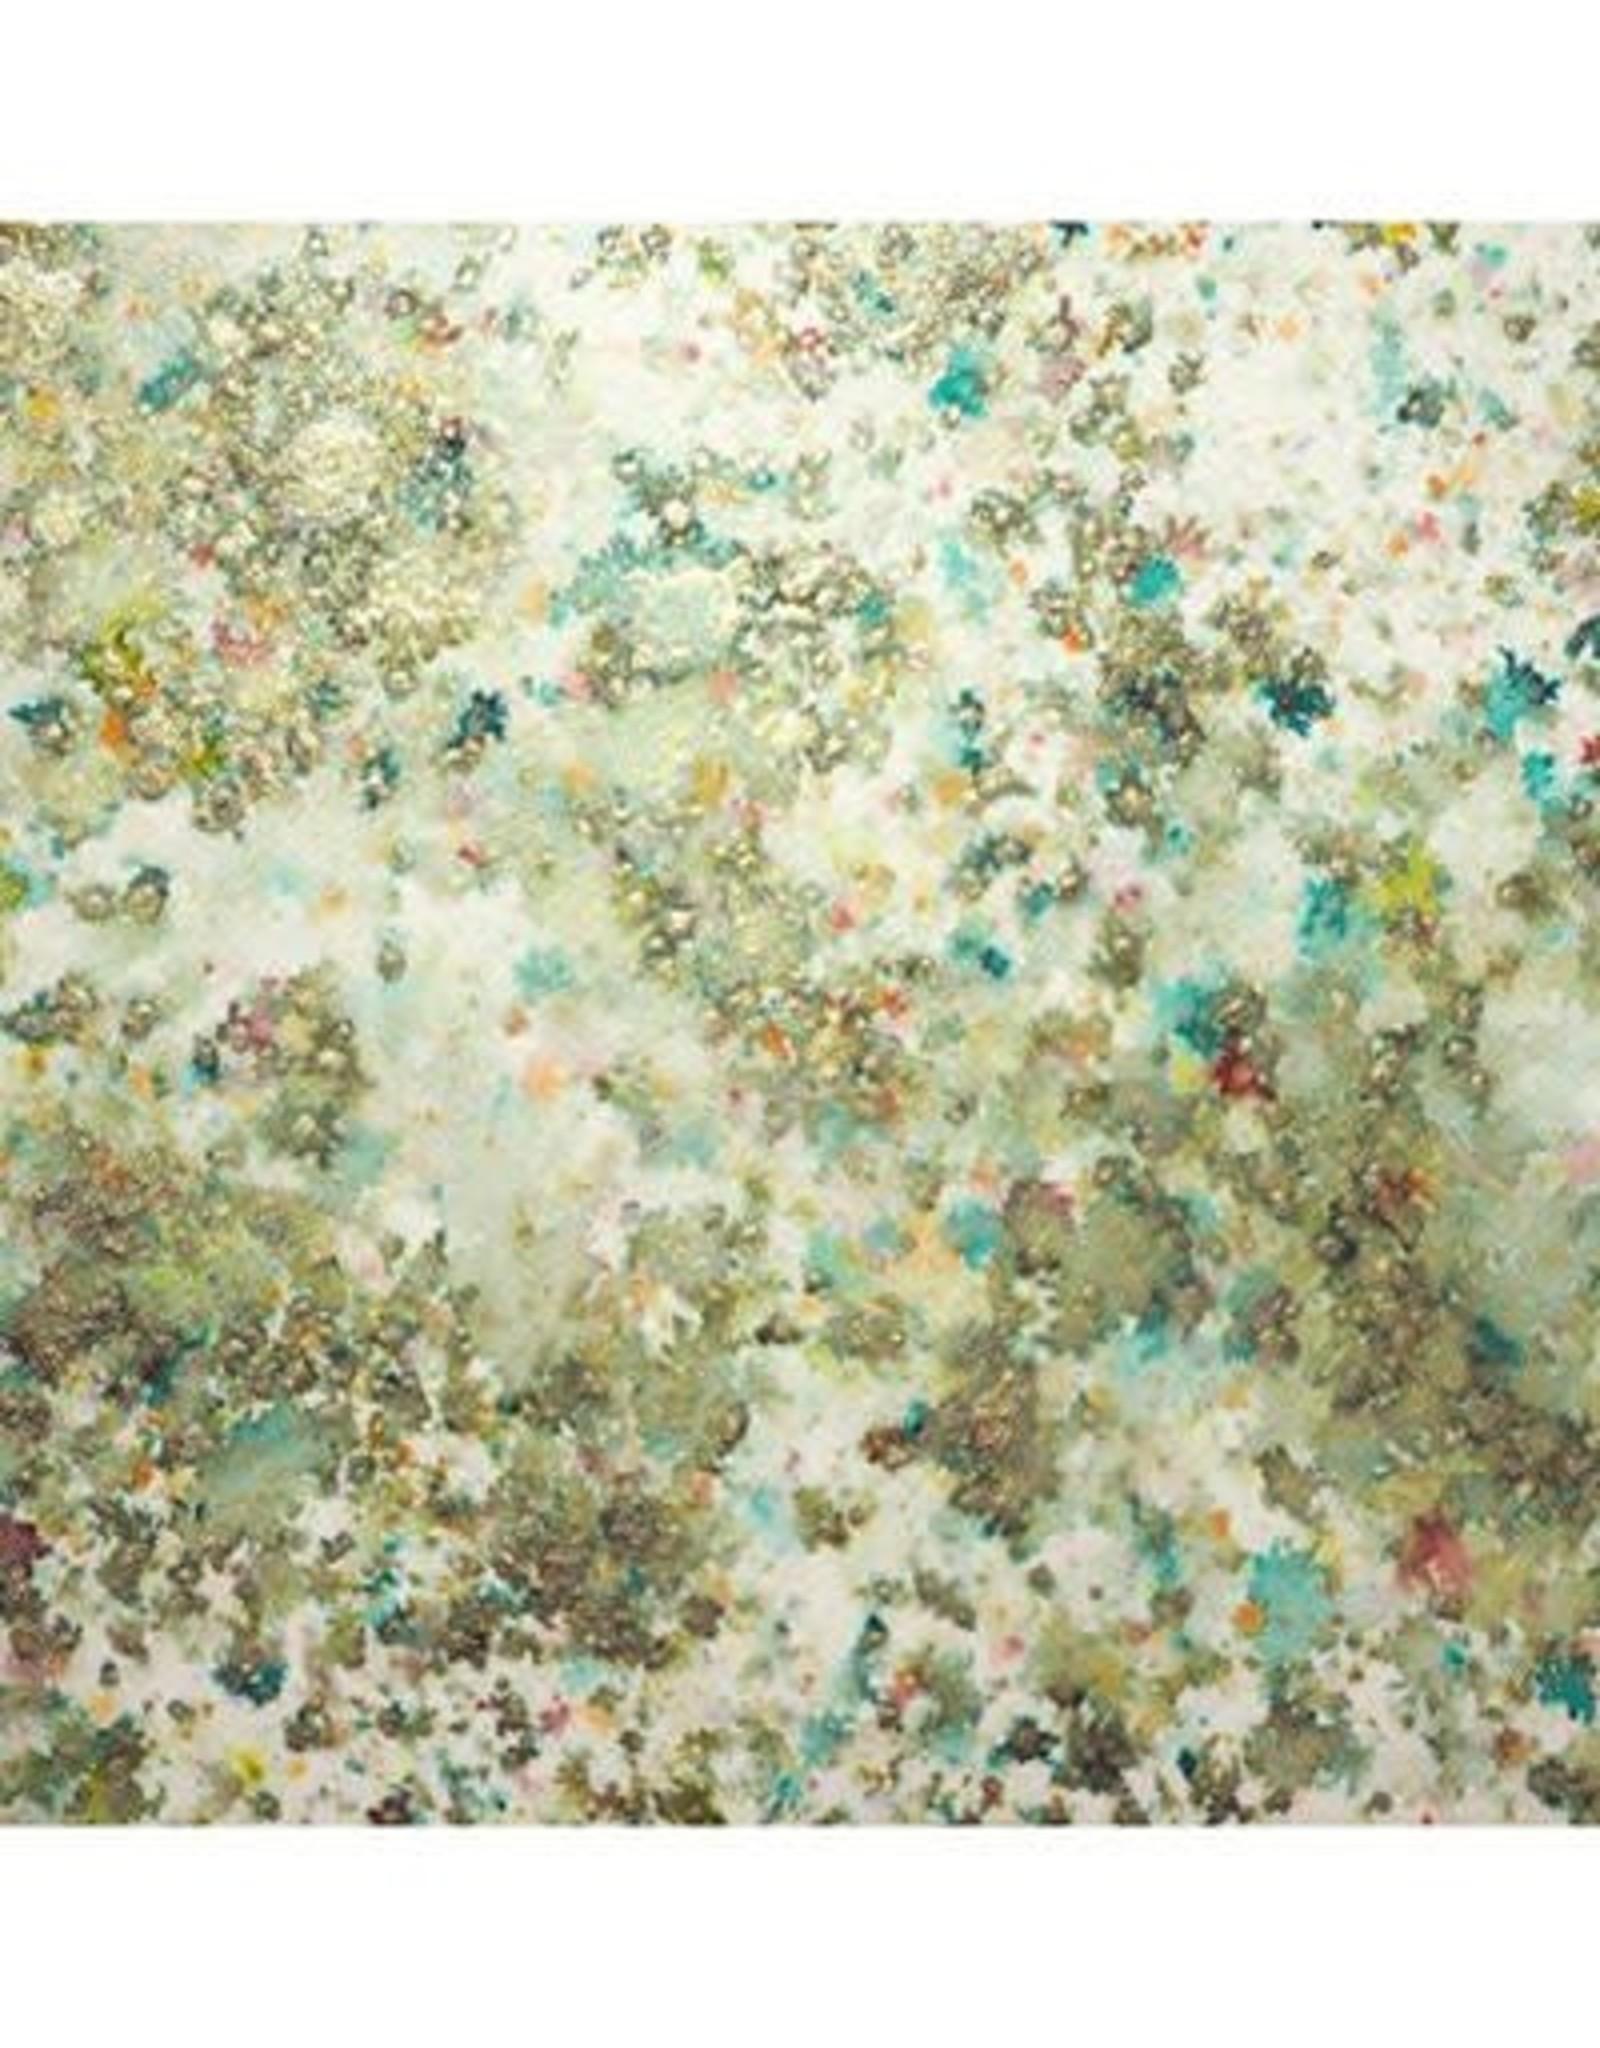 Cosmic shimmer Cosmic Shimmer pixie podwer Pale Olive